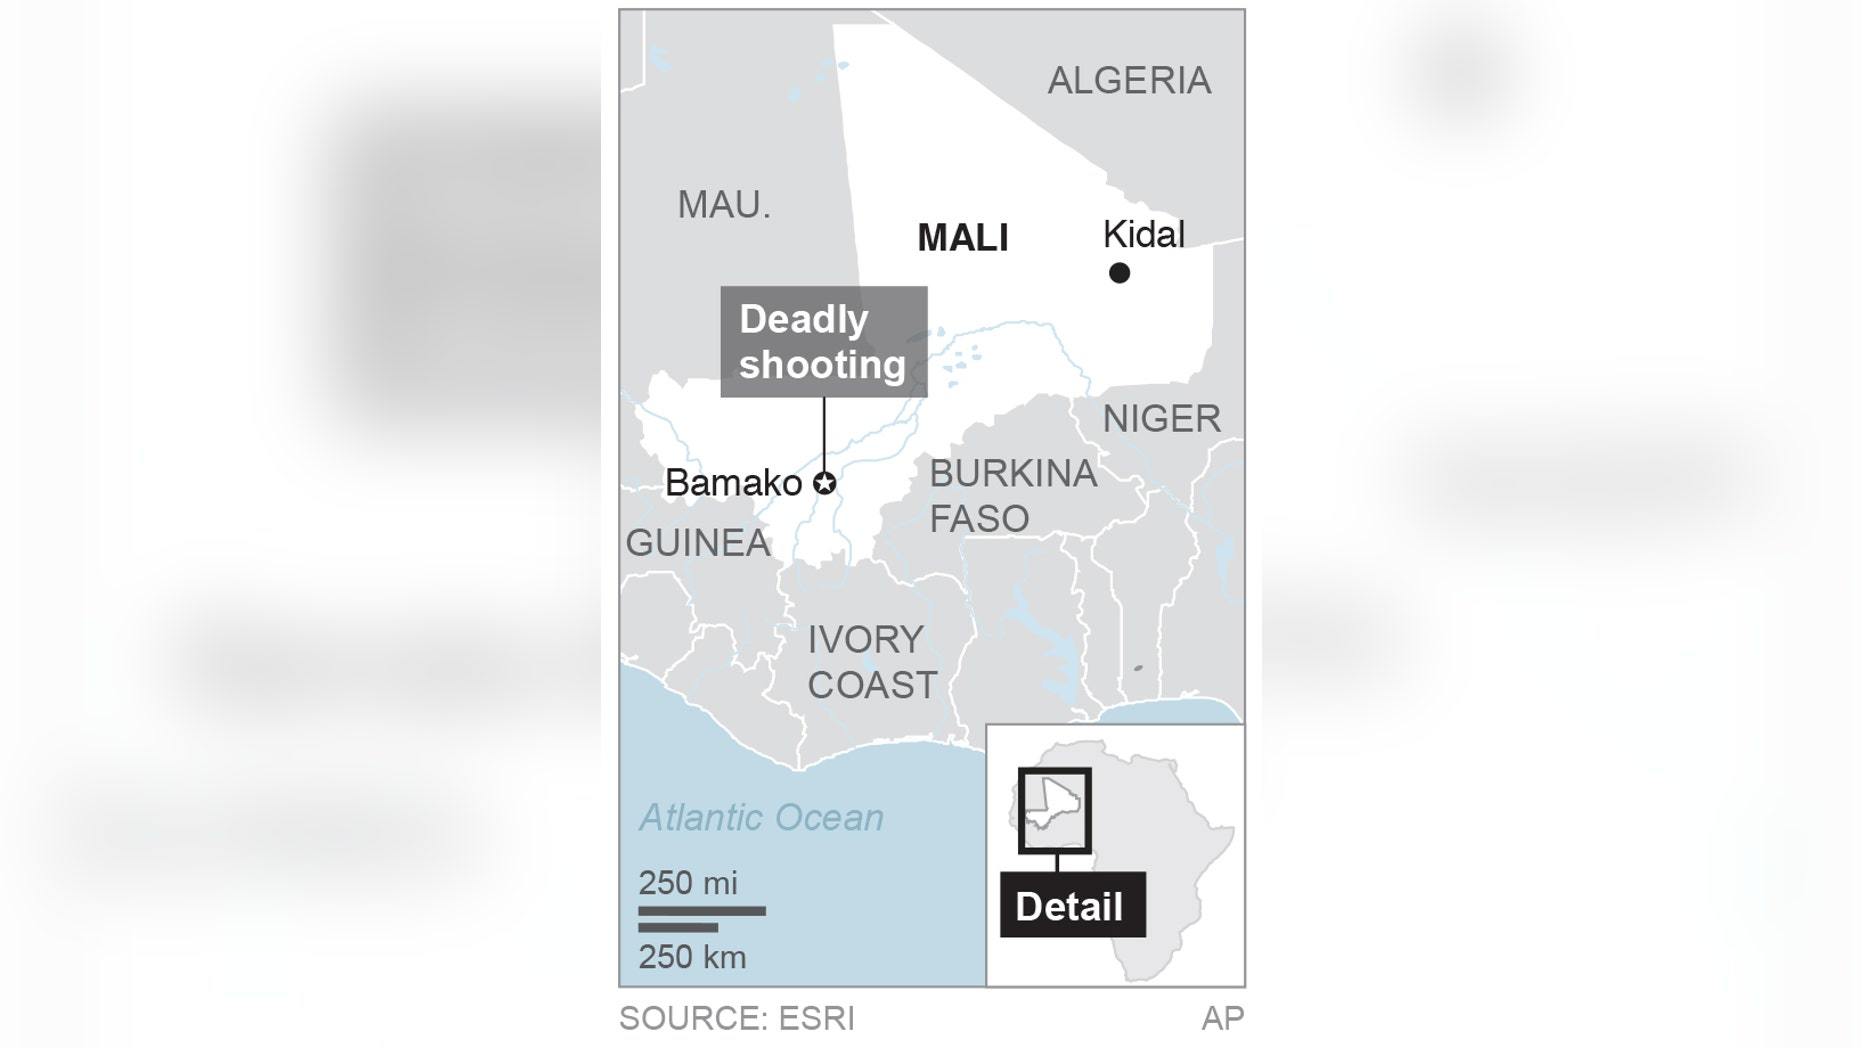 Map locates Bamako, Mali; 1c x 3 inches; 46.5 mm x 76 mm;